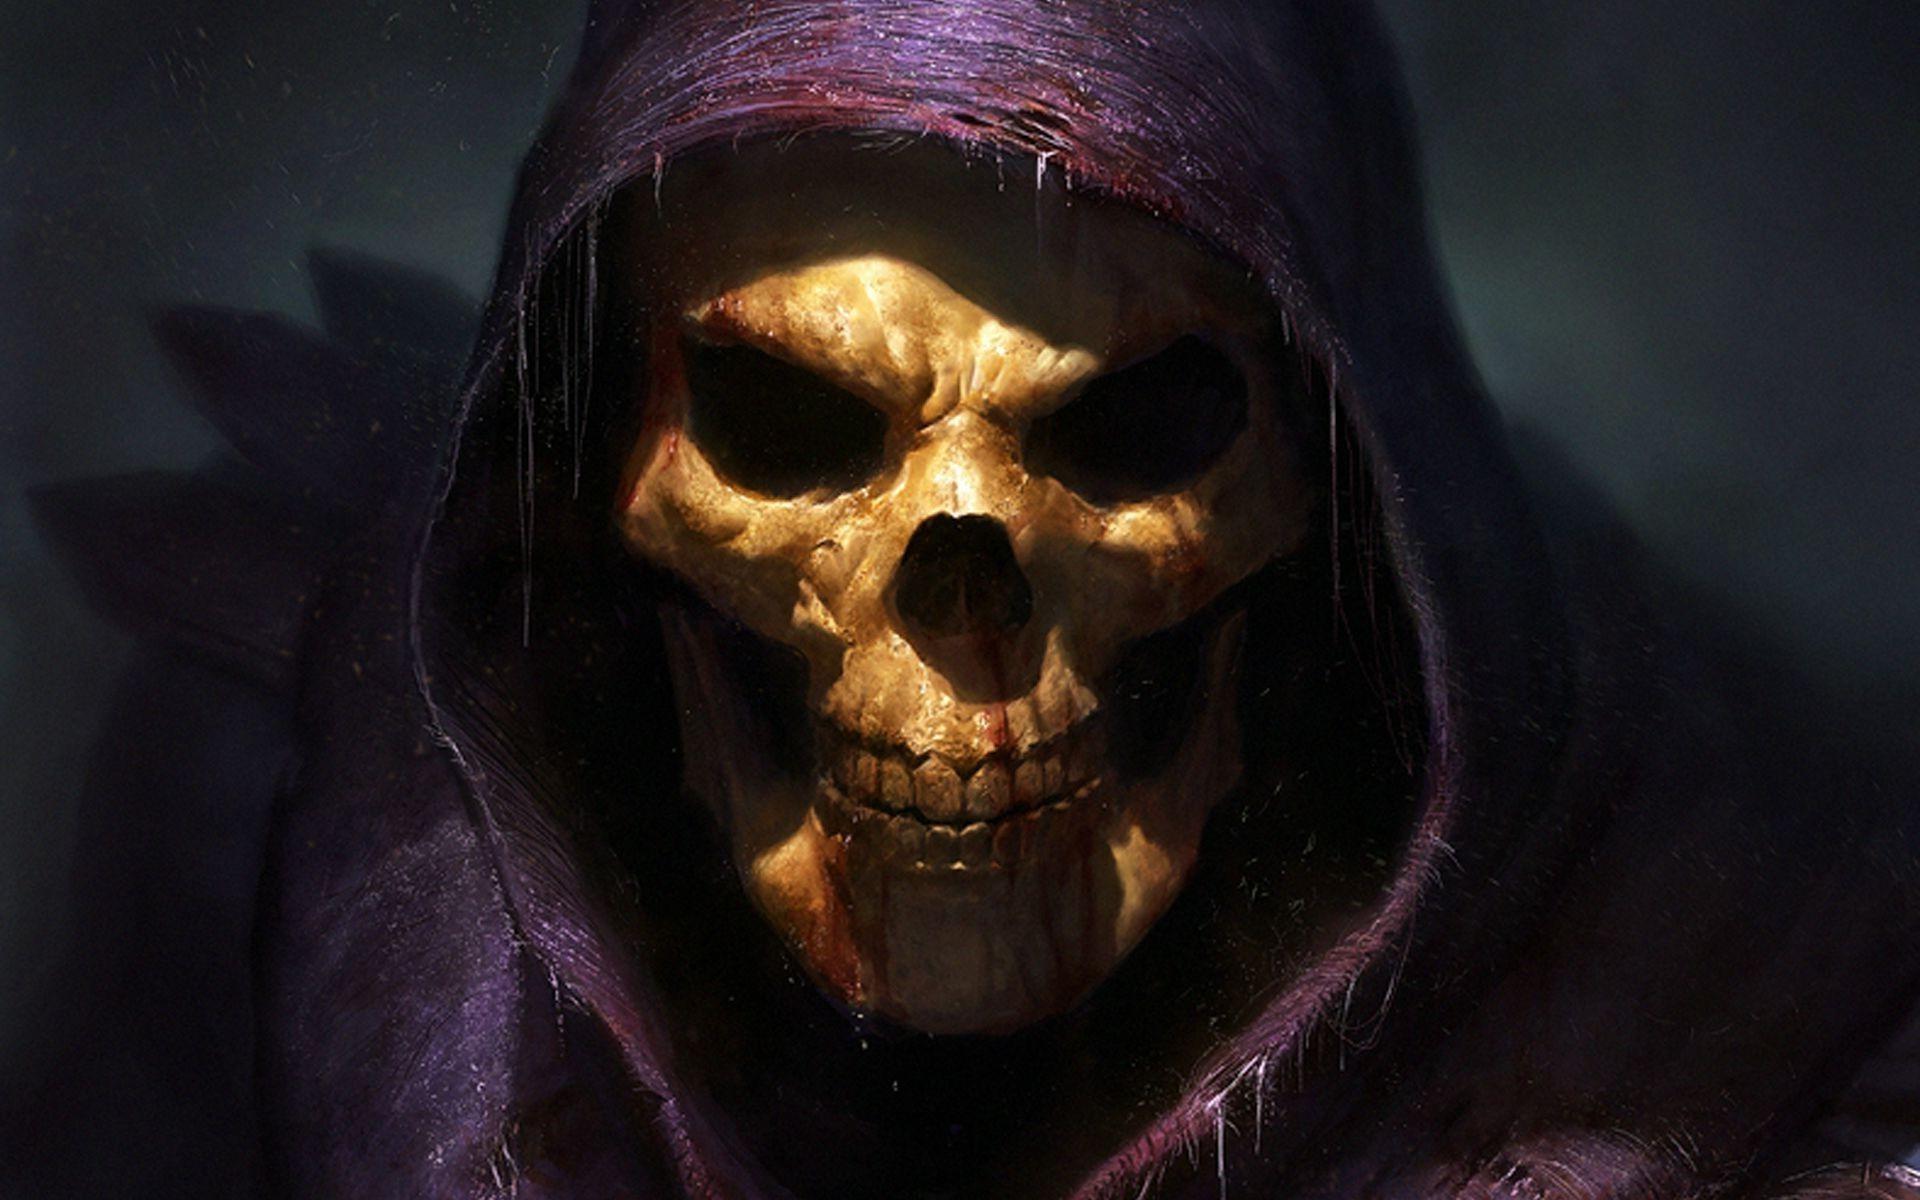 Skeletor, Fantasy Art, Skull, Grim Reaper, He Man, Spooky Wallpapers HD /  Desktop and Mobile Backgrounds